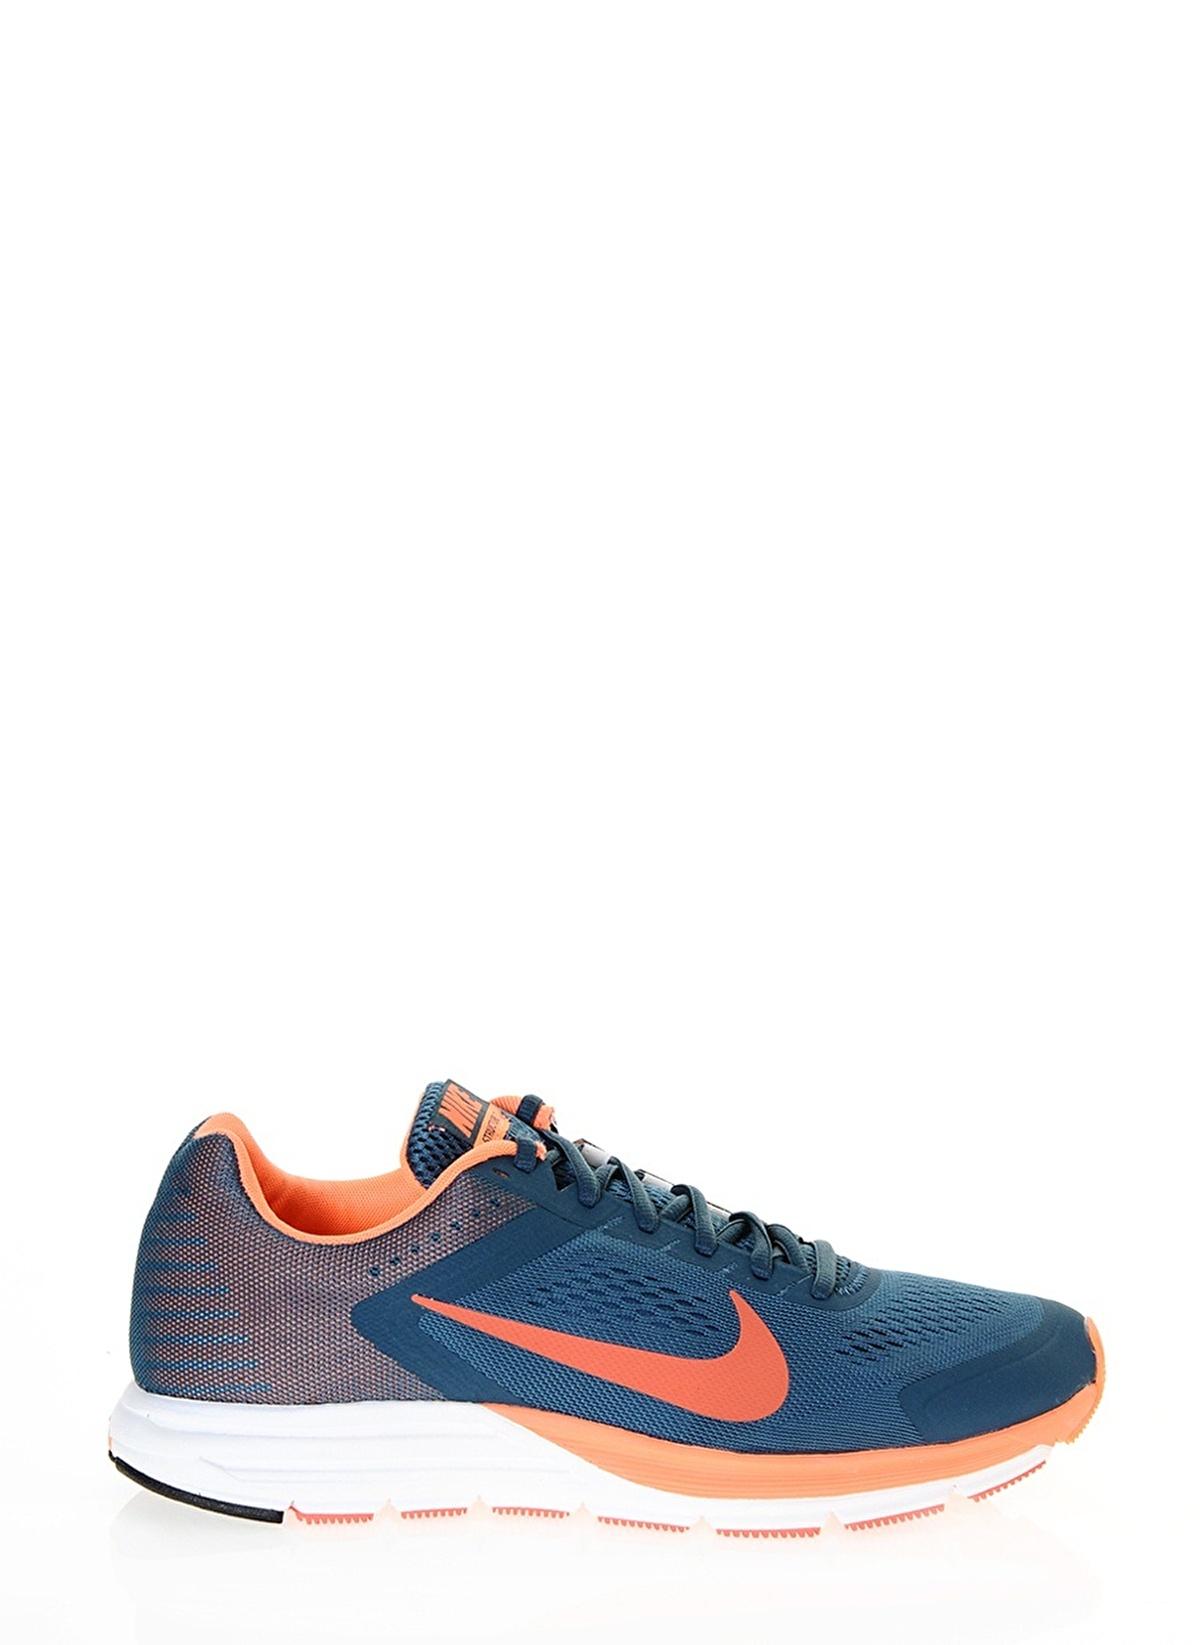 quality design 86e17 f69ec 615587-388-Nike-Zoom-Structure+-17